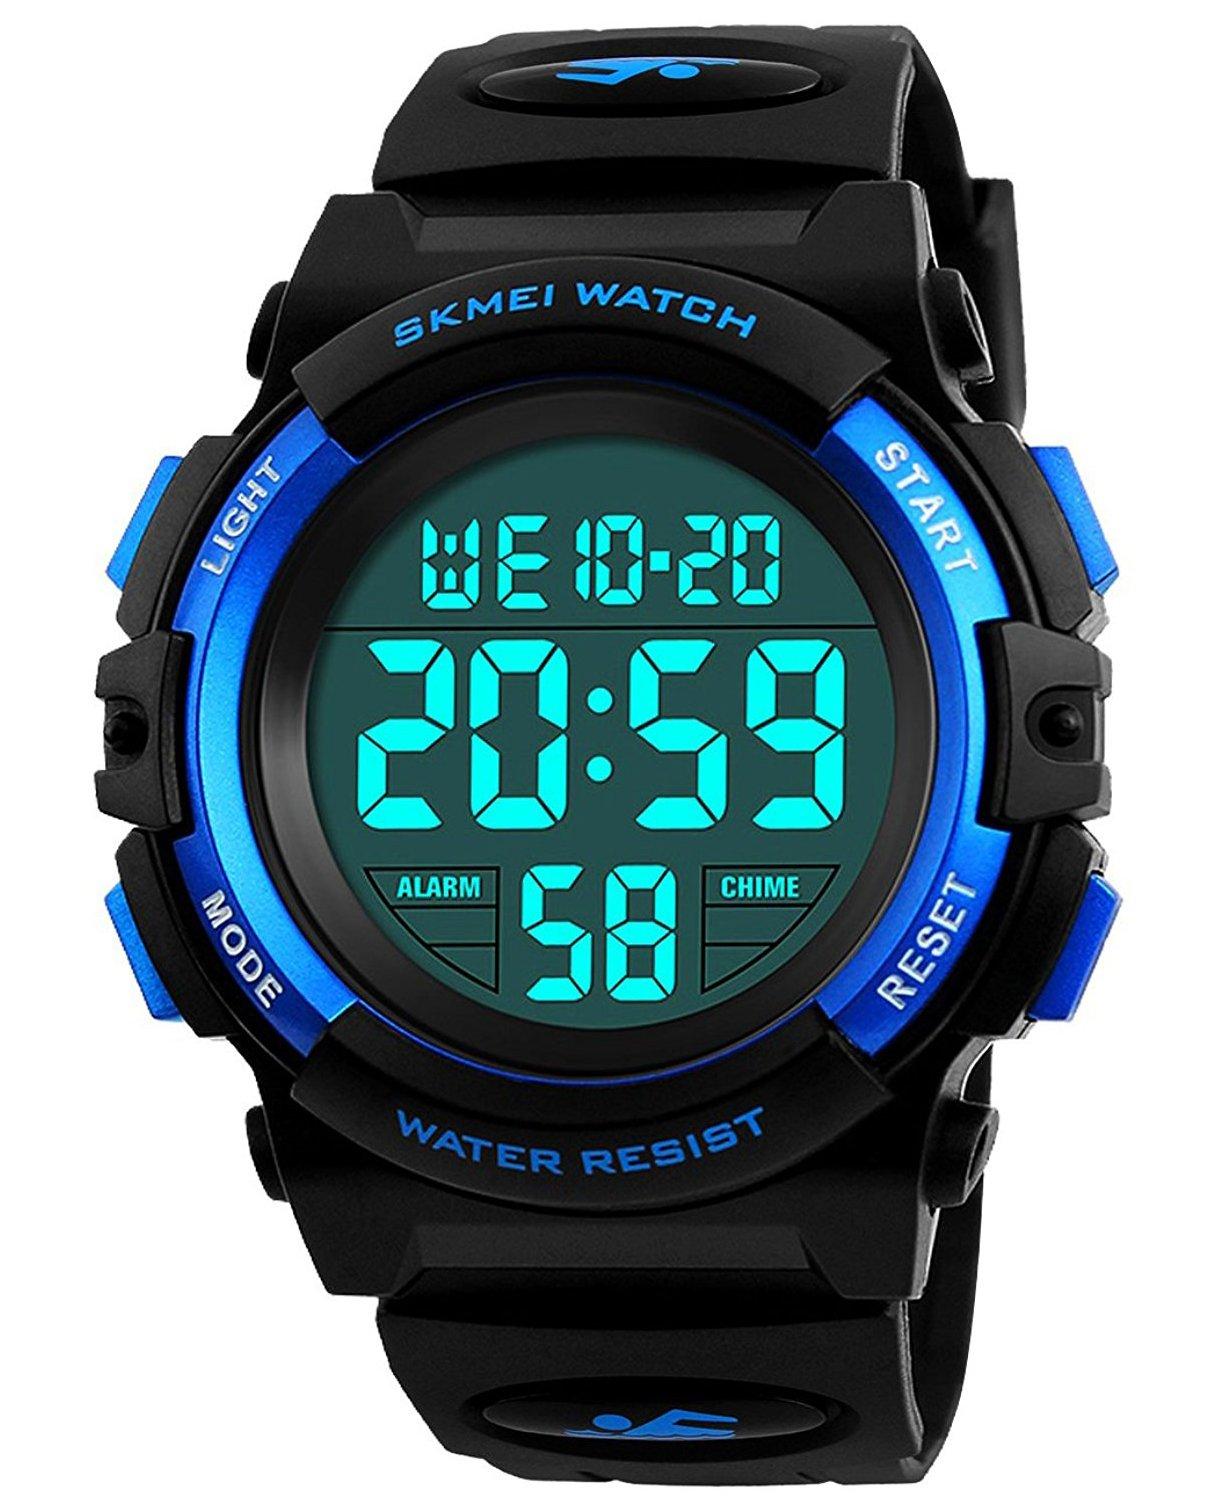 Kids Digital Sports Watch, Apantimx Boys Girls Waterproof LED Watches Wrist Alarm Watch for Children by Apantimx